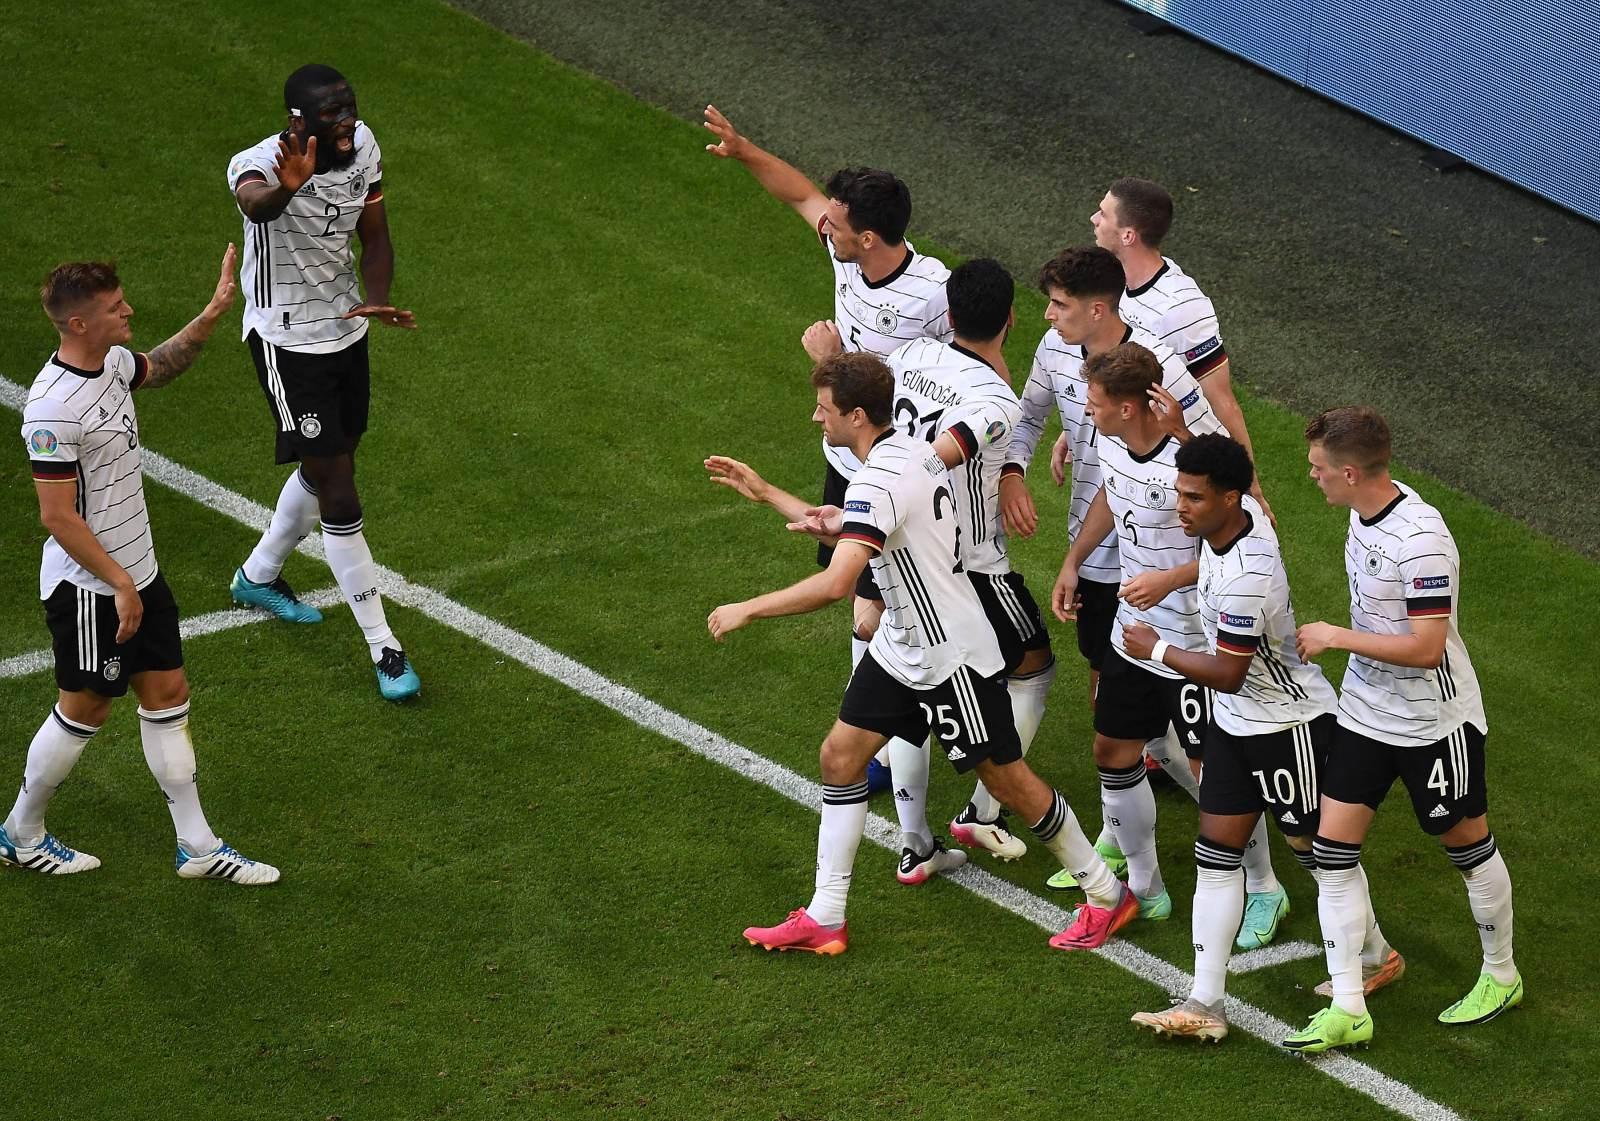 Лихтенштейн - Германия - 0:2 (завершён)